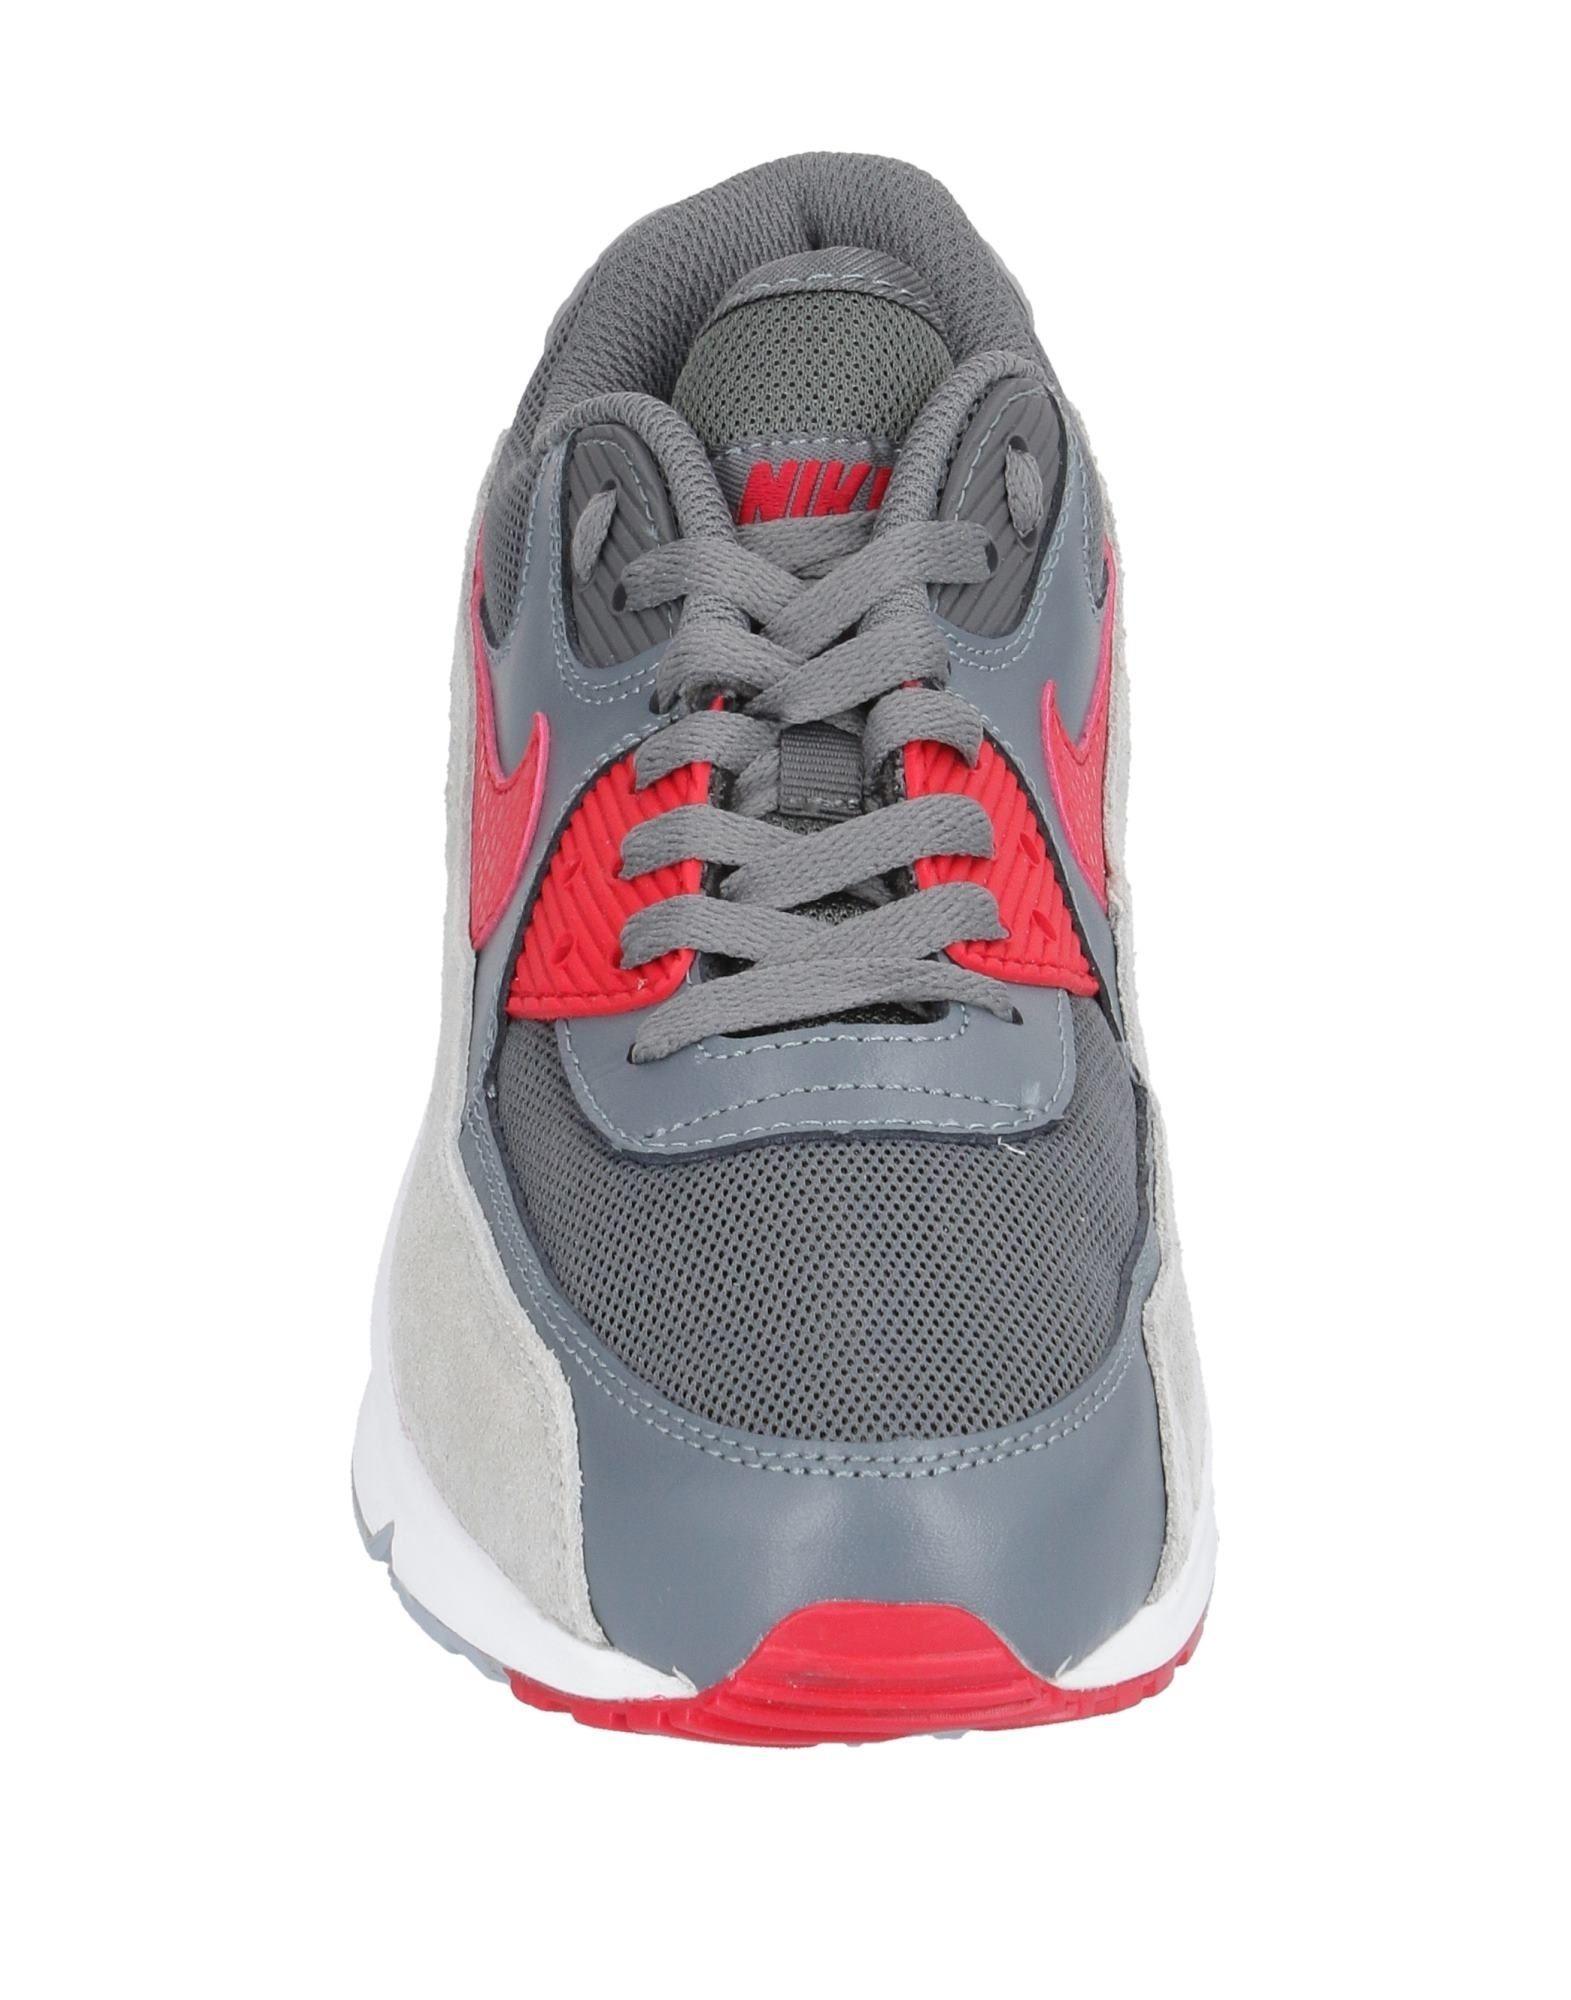 Sneakers & Tennis basses Nike en coloris Gris KfMl